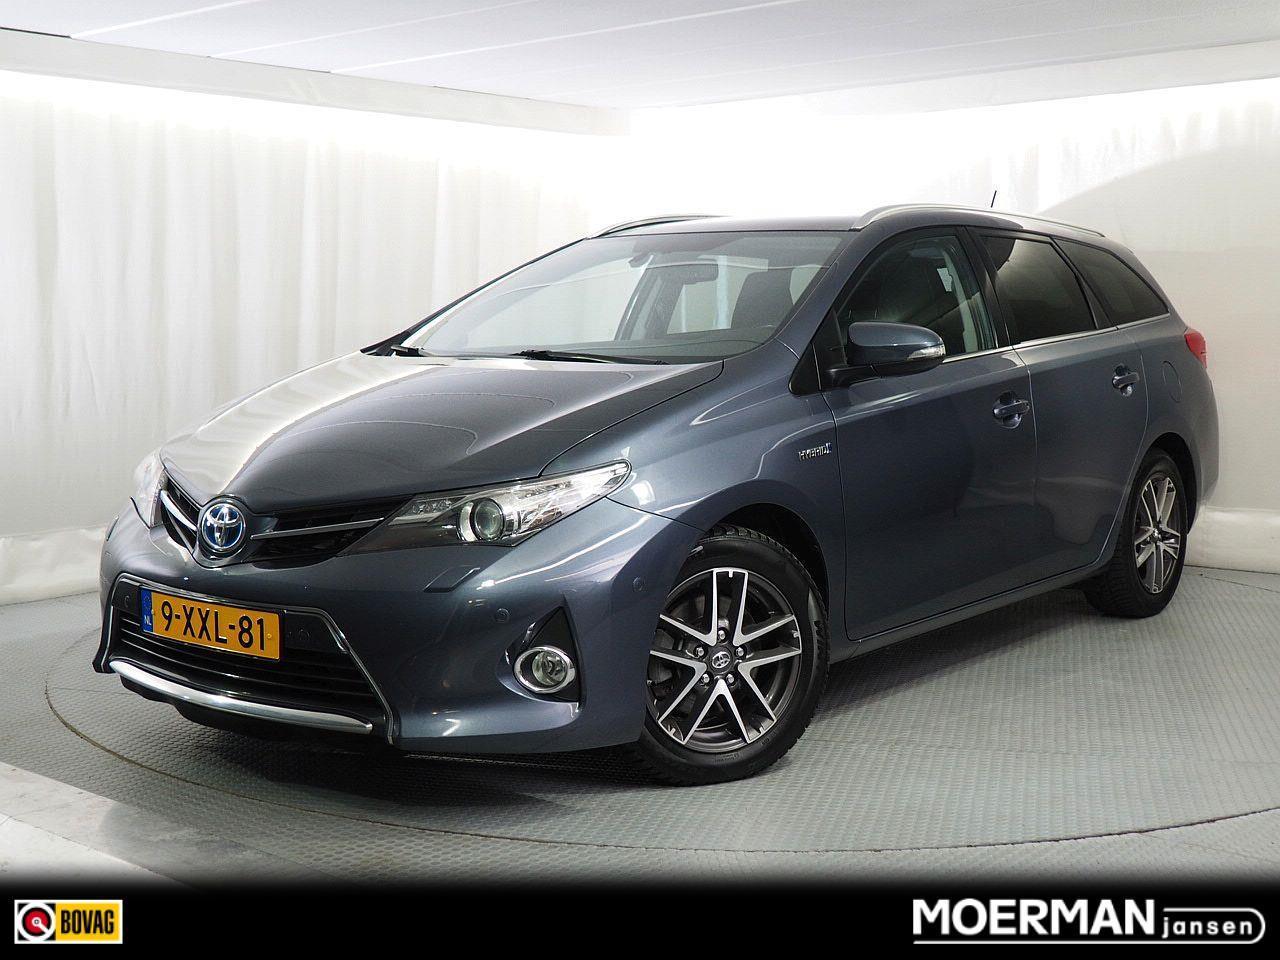 Toyota Auris Touring sports 1.8 hybrid lease / panoramadak / parkeersensoren v+a / navigatie /  1e eigenaar /  dealer auto